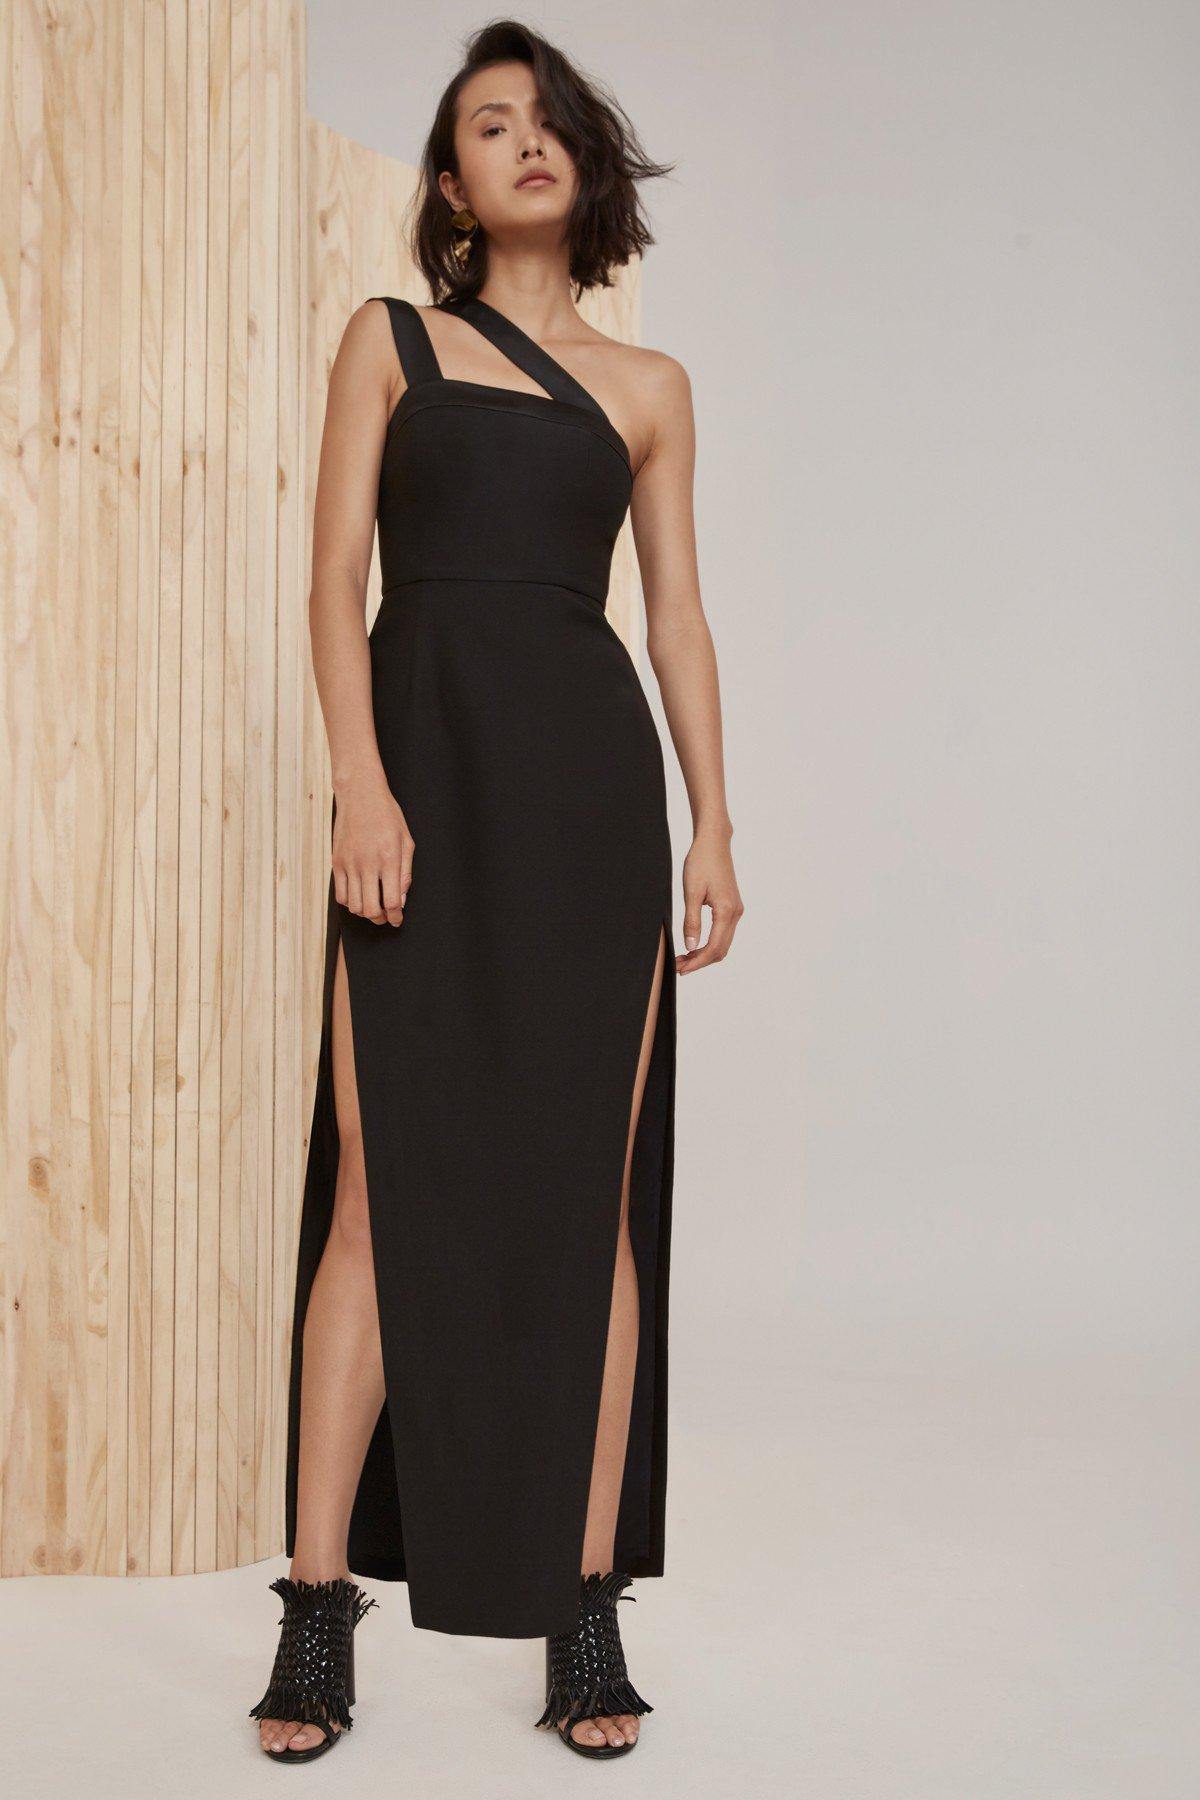 Shop C/MEO Bound Together Full Length Dress.